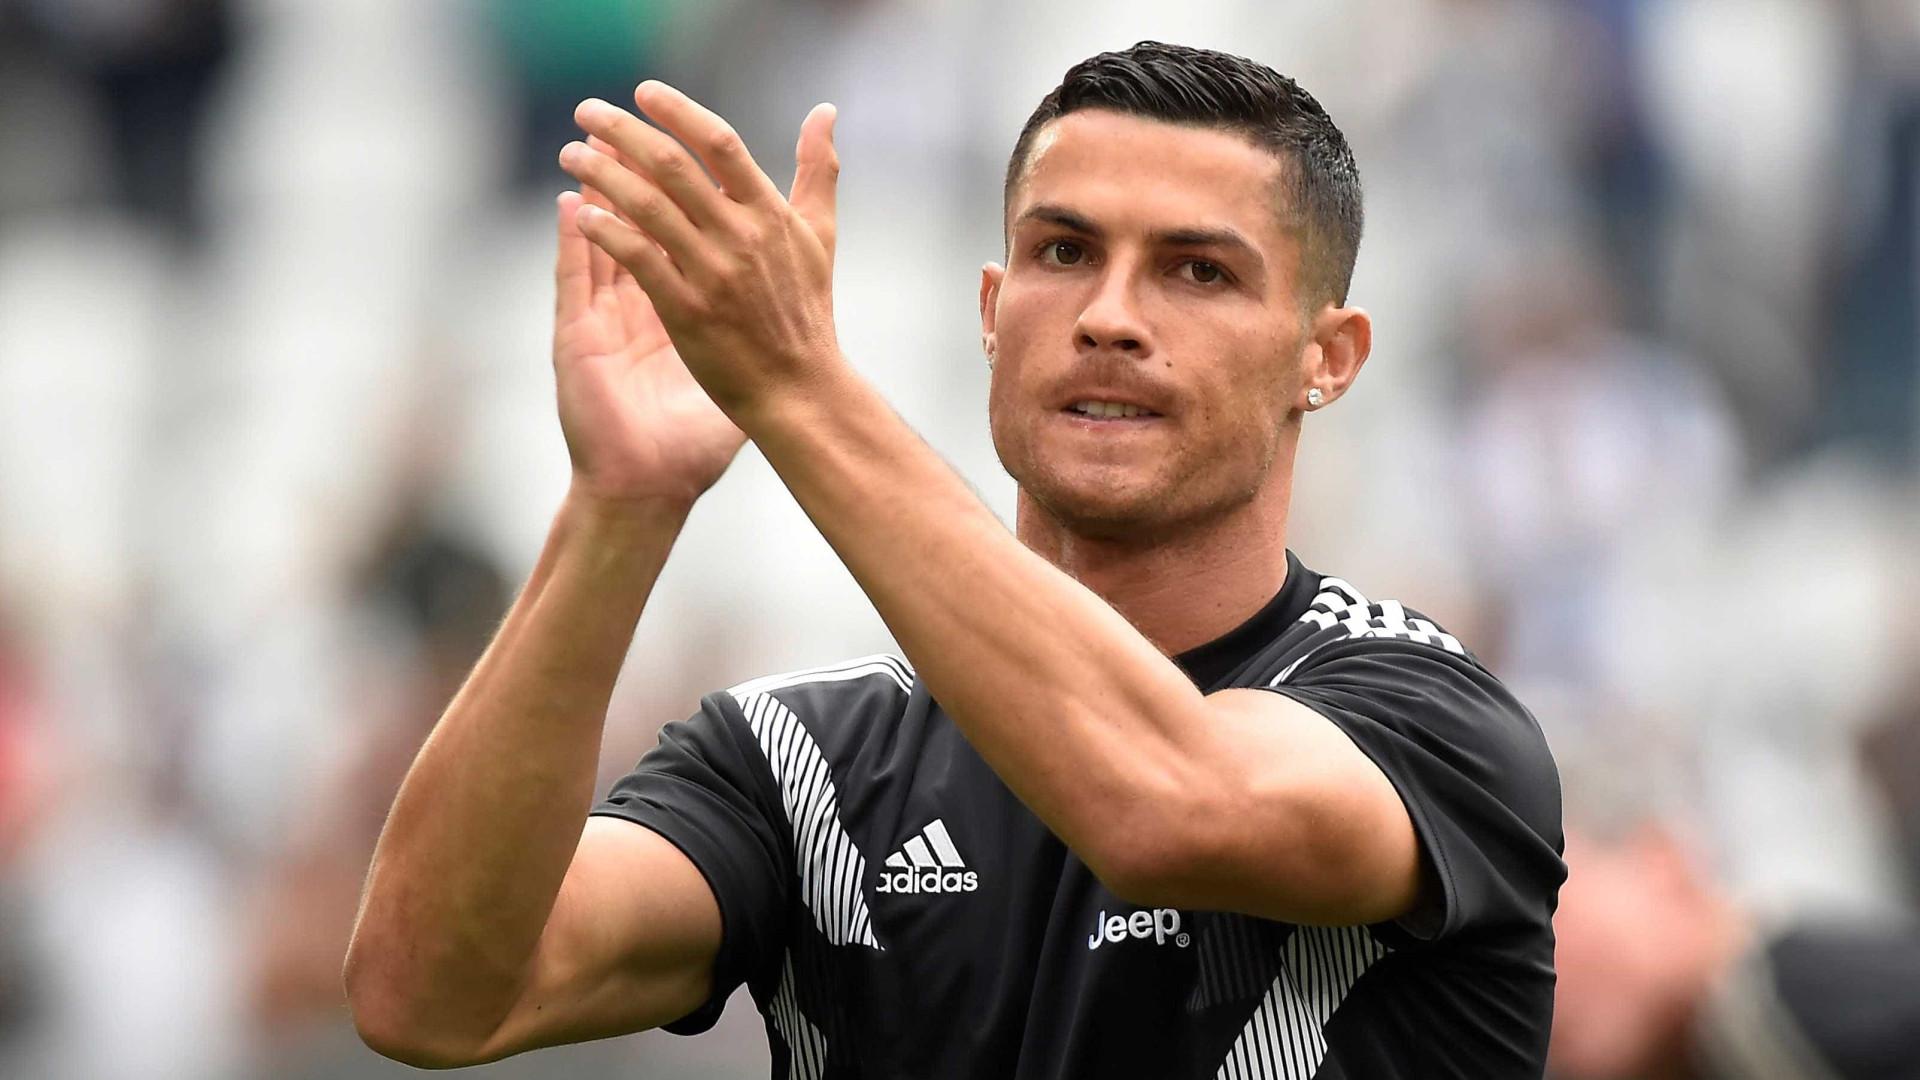 Em jejum de gols, CR7 luta contra marca negativa na Juventus